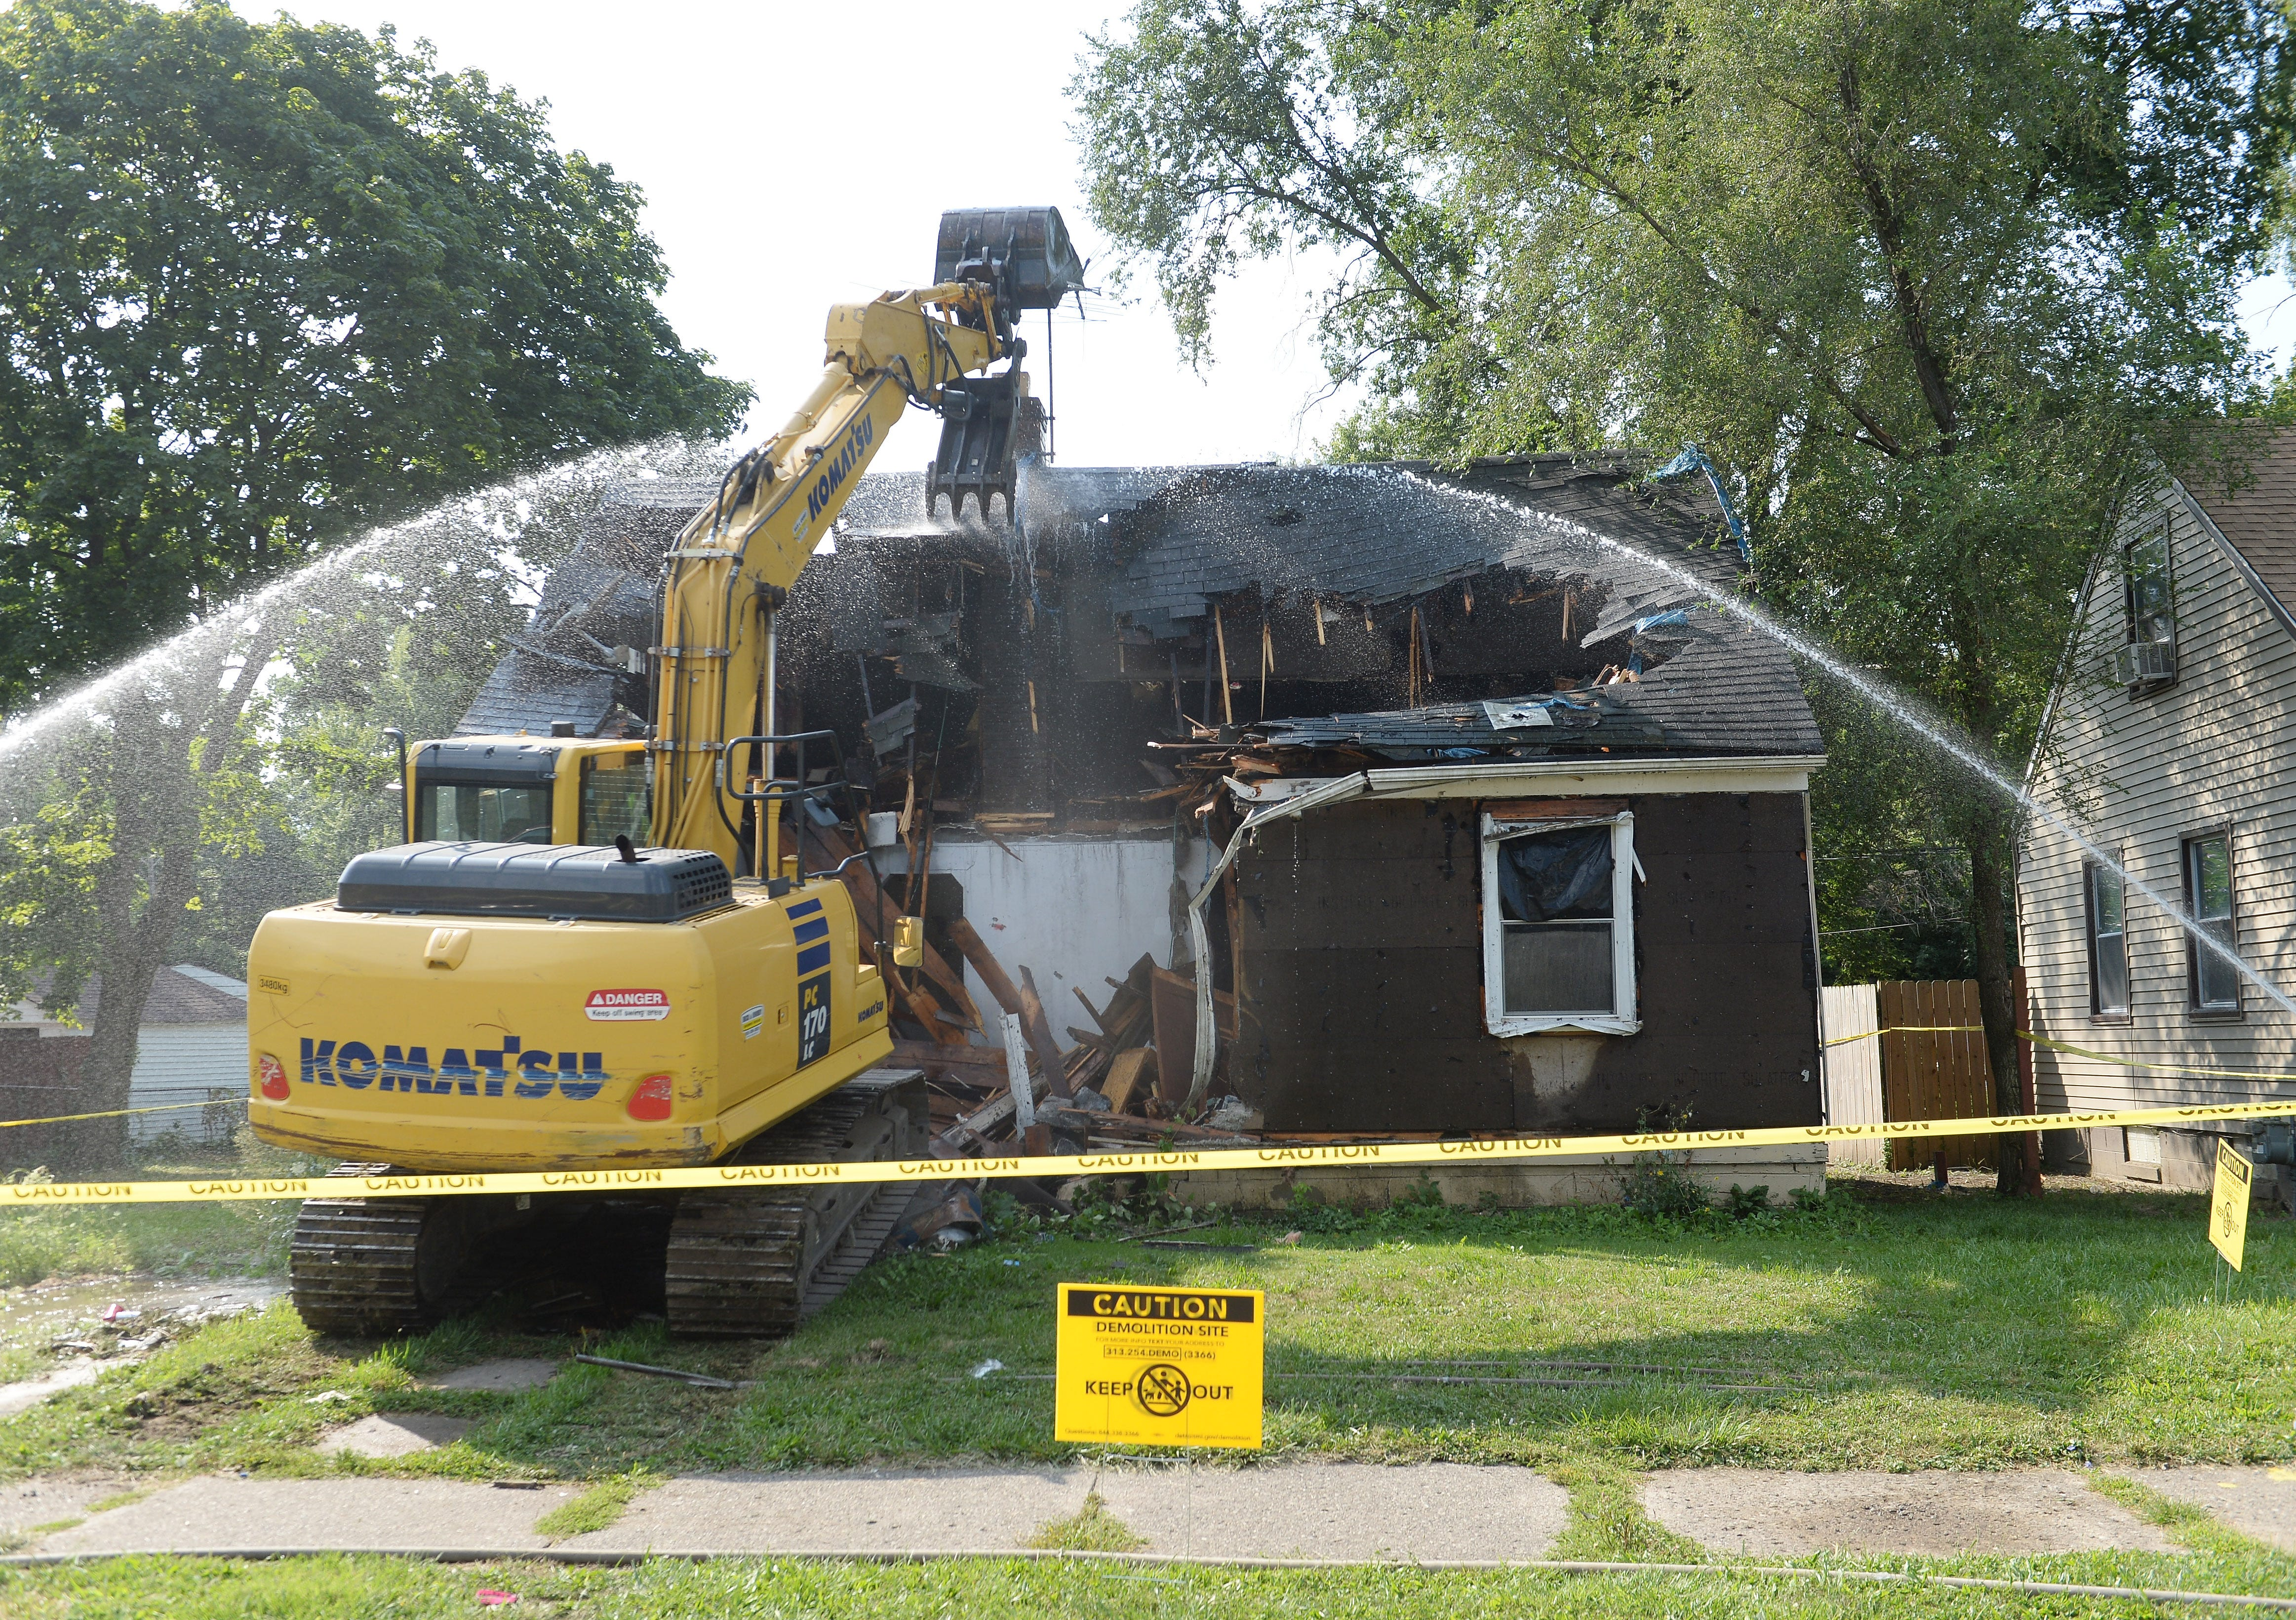 Black-owned Detroit companies get half of demolition funds